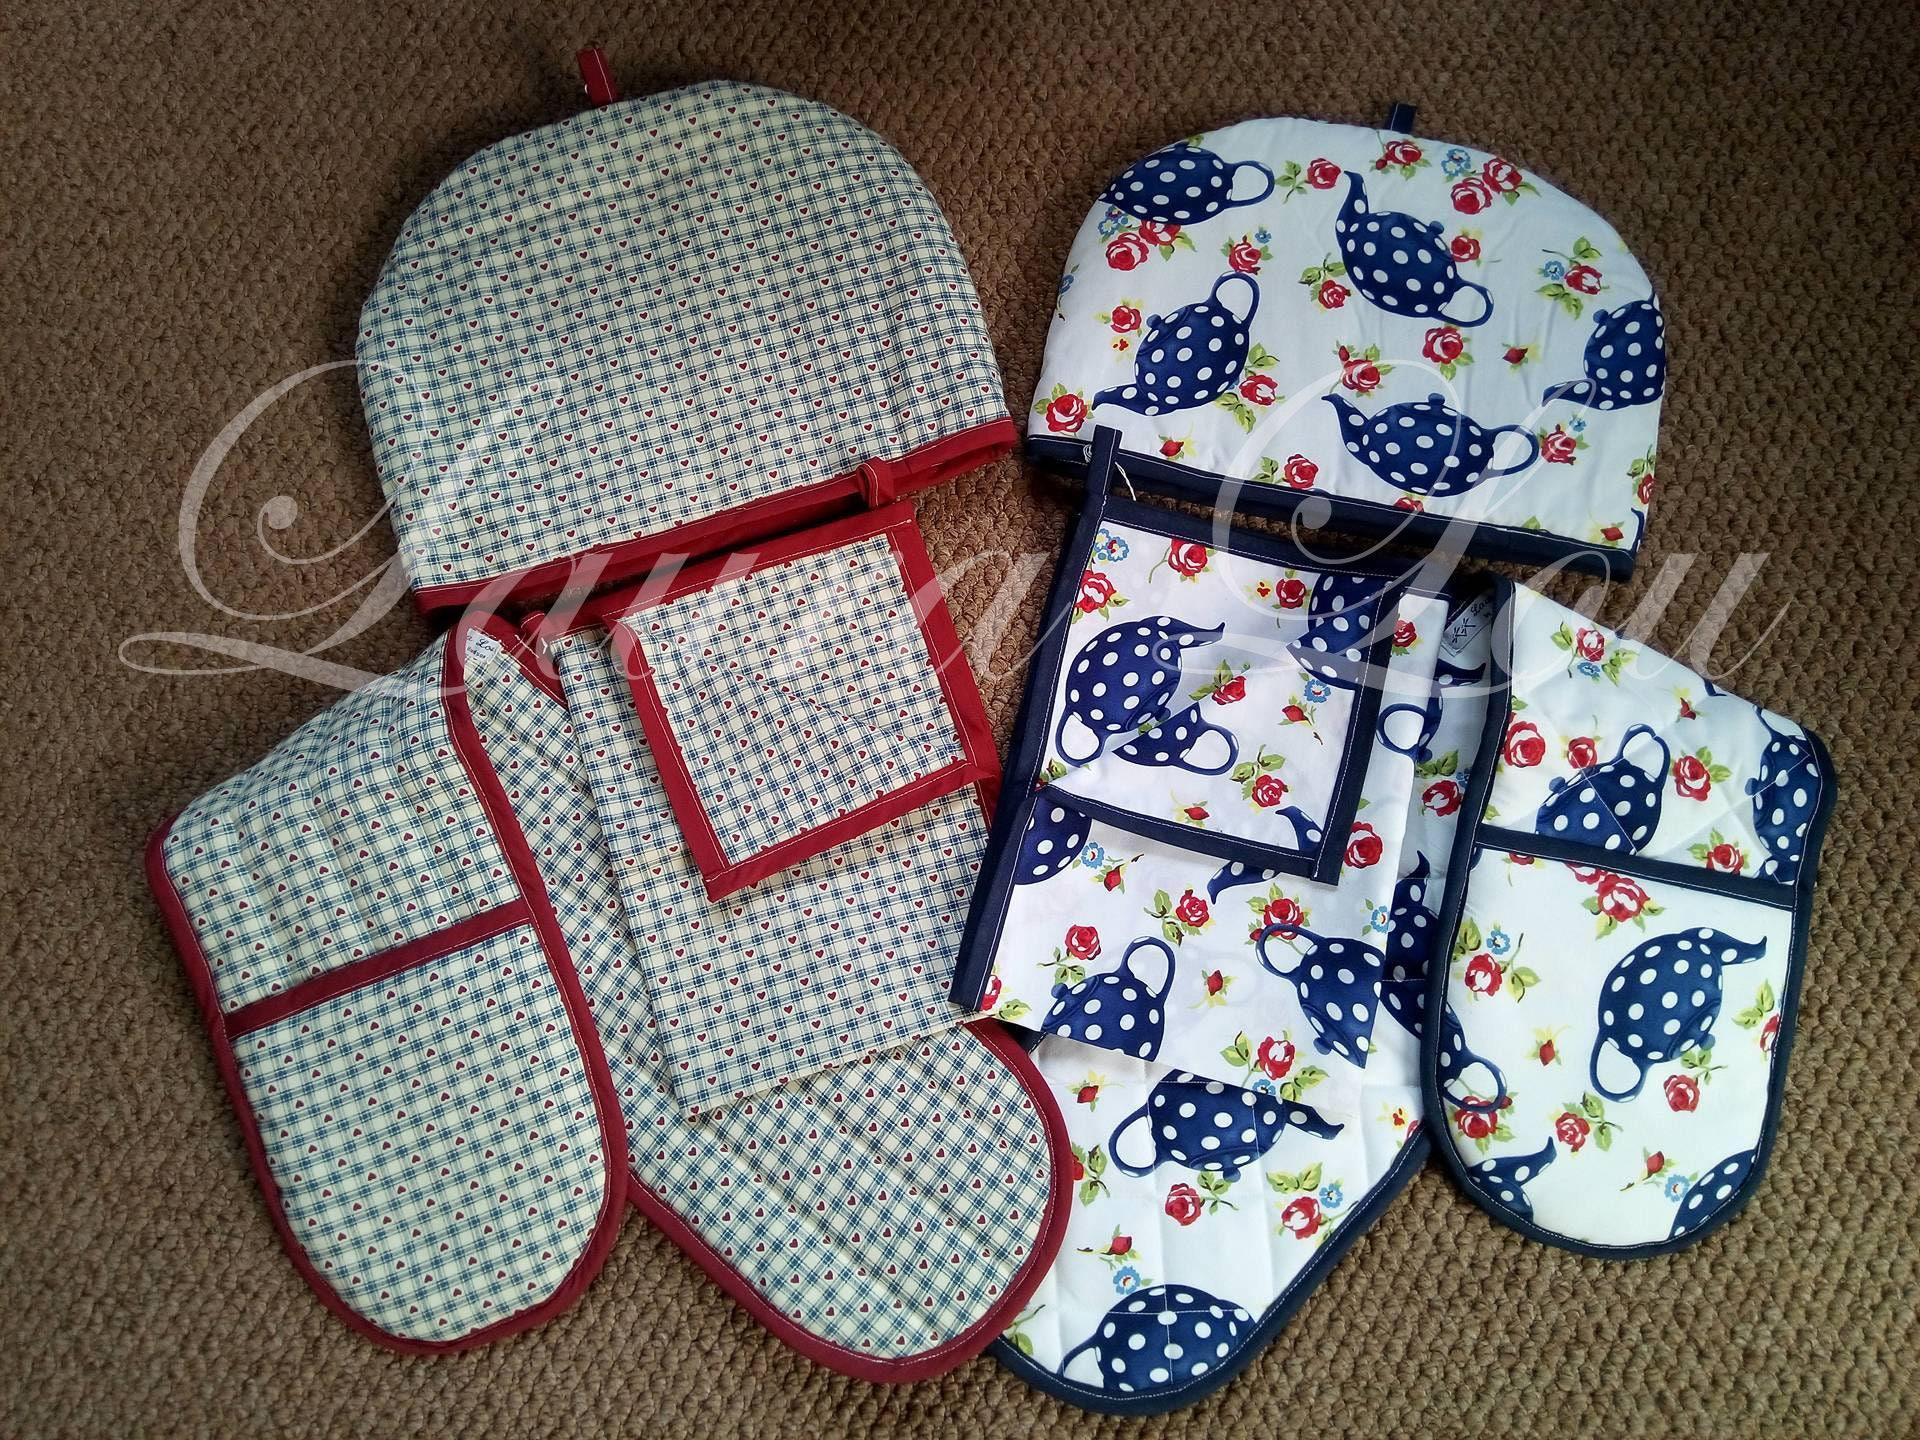 Tea Cosy Oven Gloves and Tea Cloth 3 piece set  WhiteNavy Teapot or BurgundyBlue Heart Check